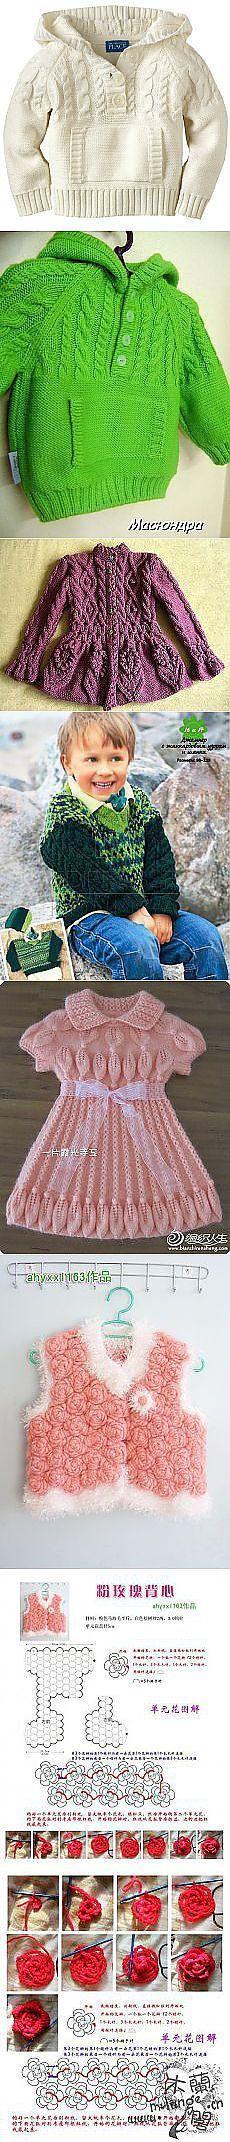 Lyudmila Mikhailova: tricoter pour les enfants |  Postila.ru